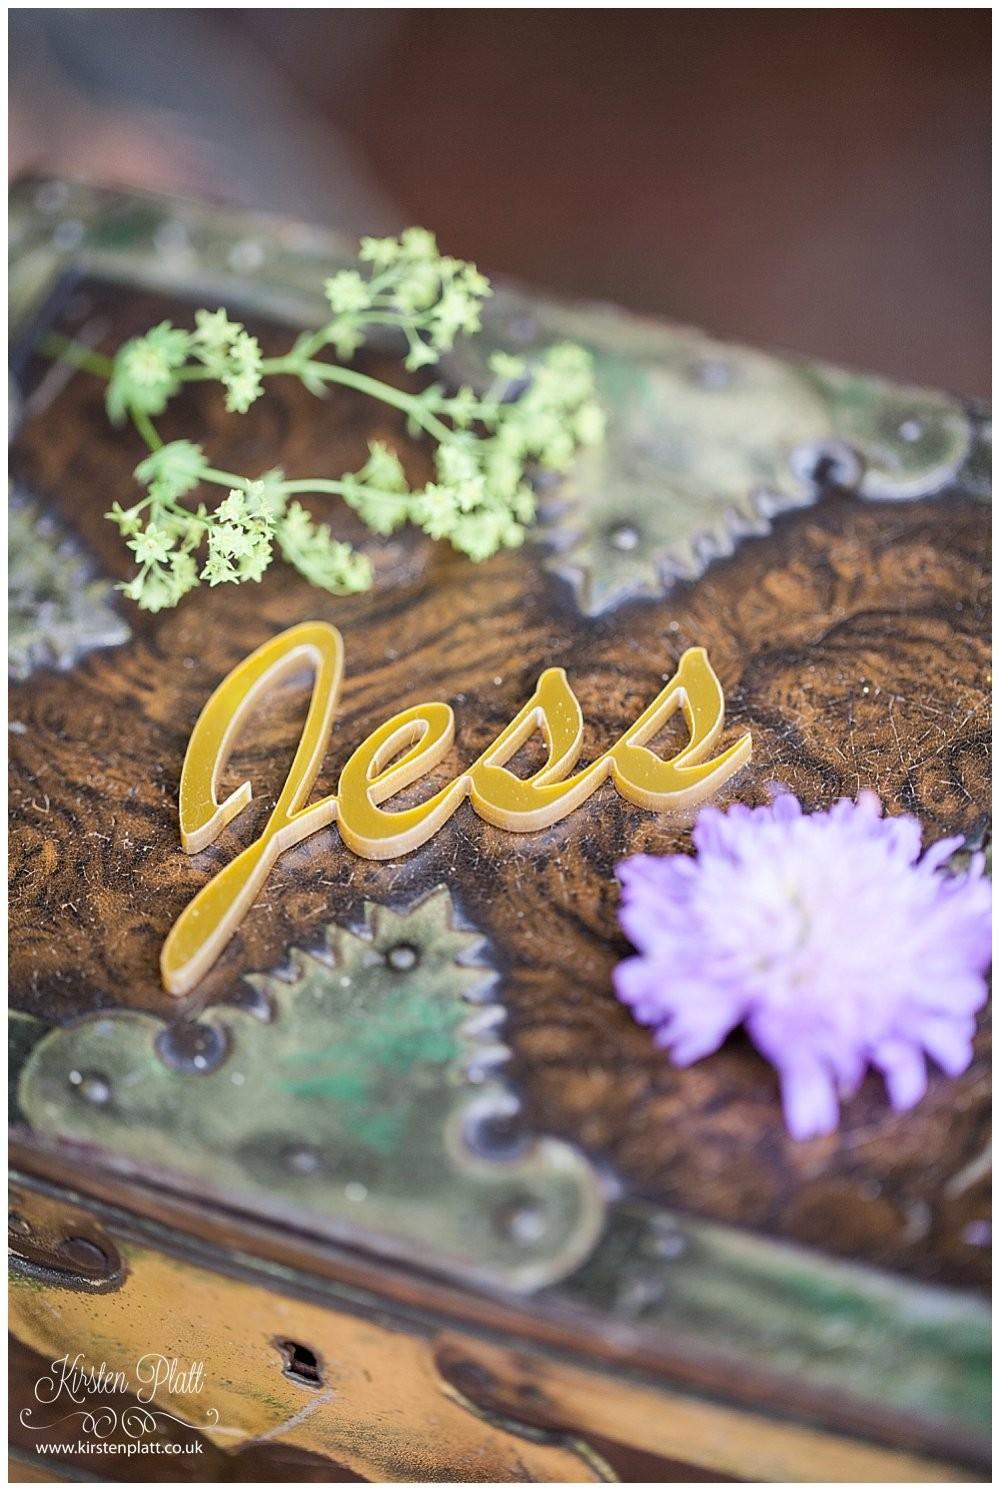 Bespoke and Oak Co Personalised wedding place settings